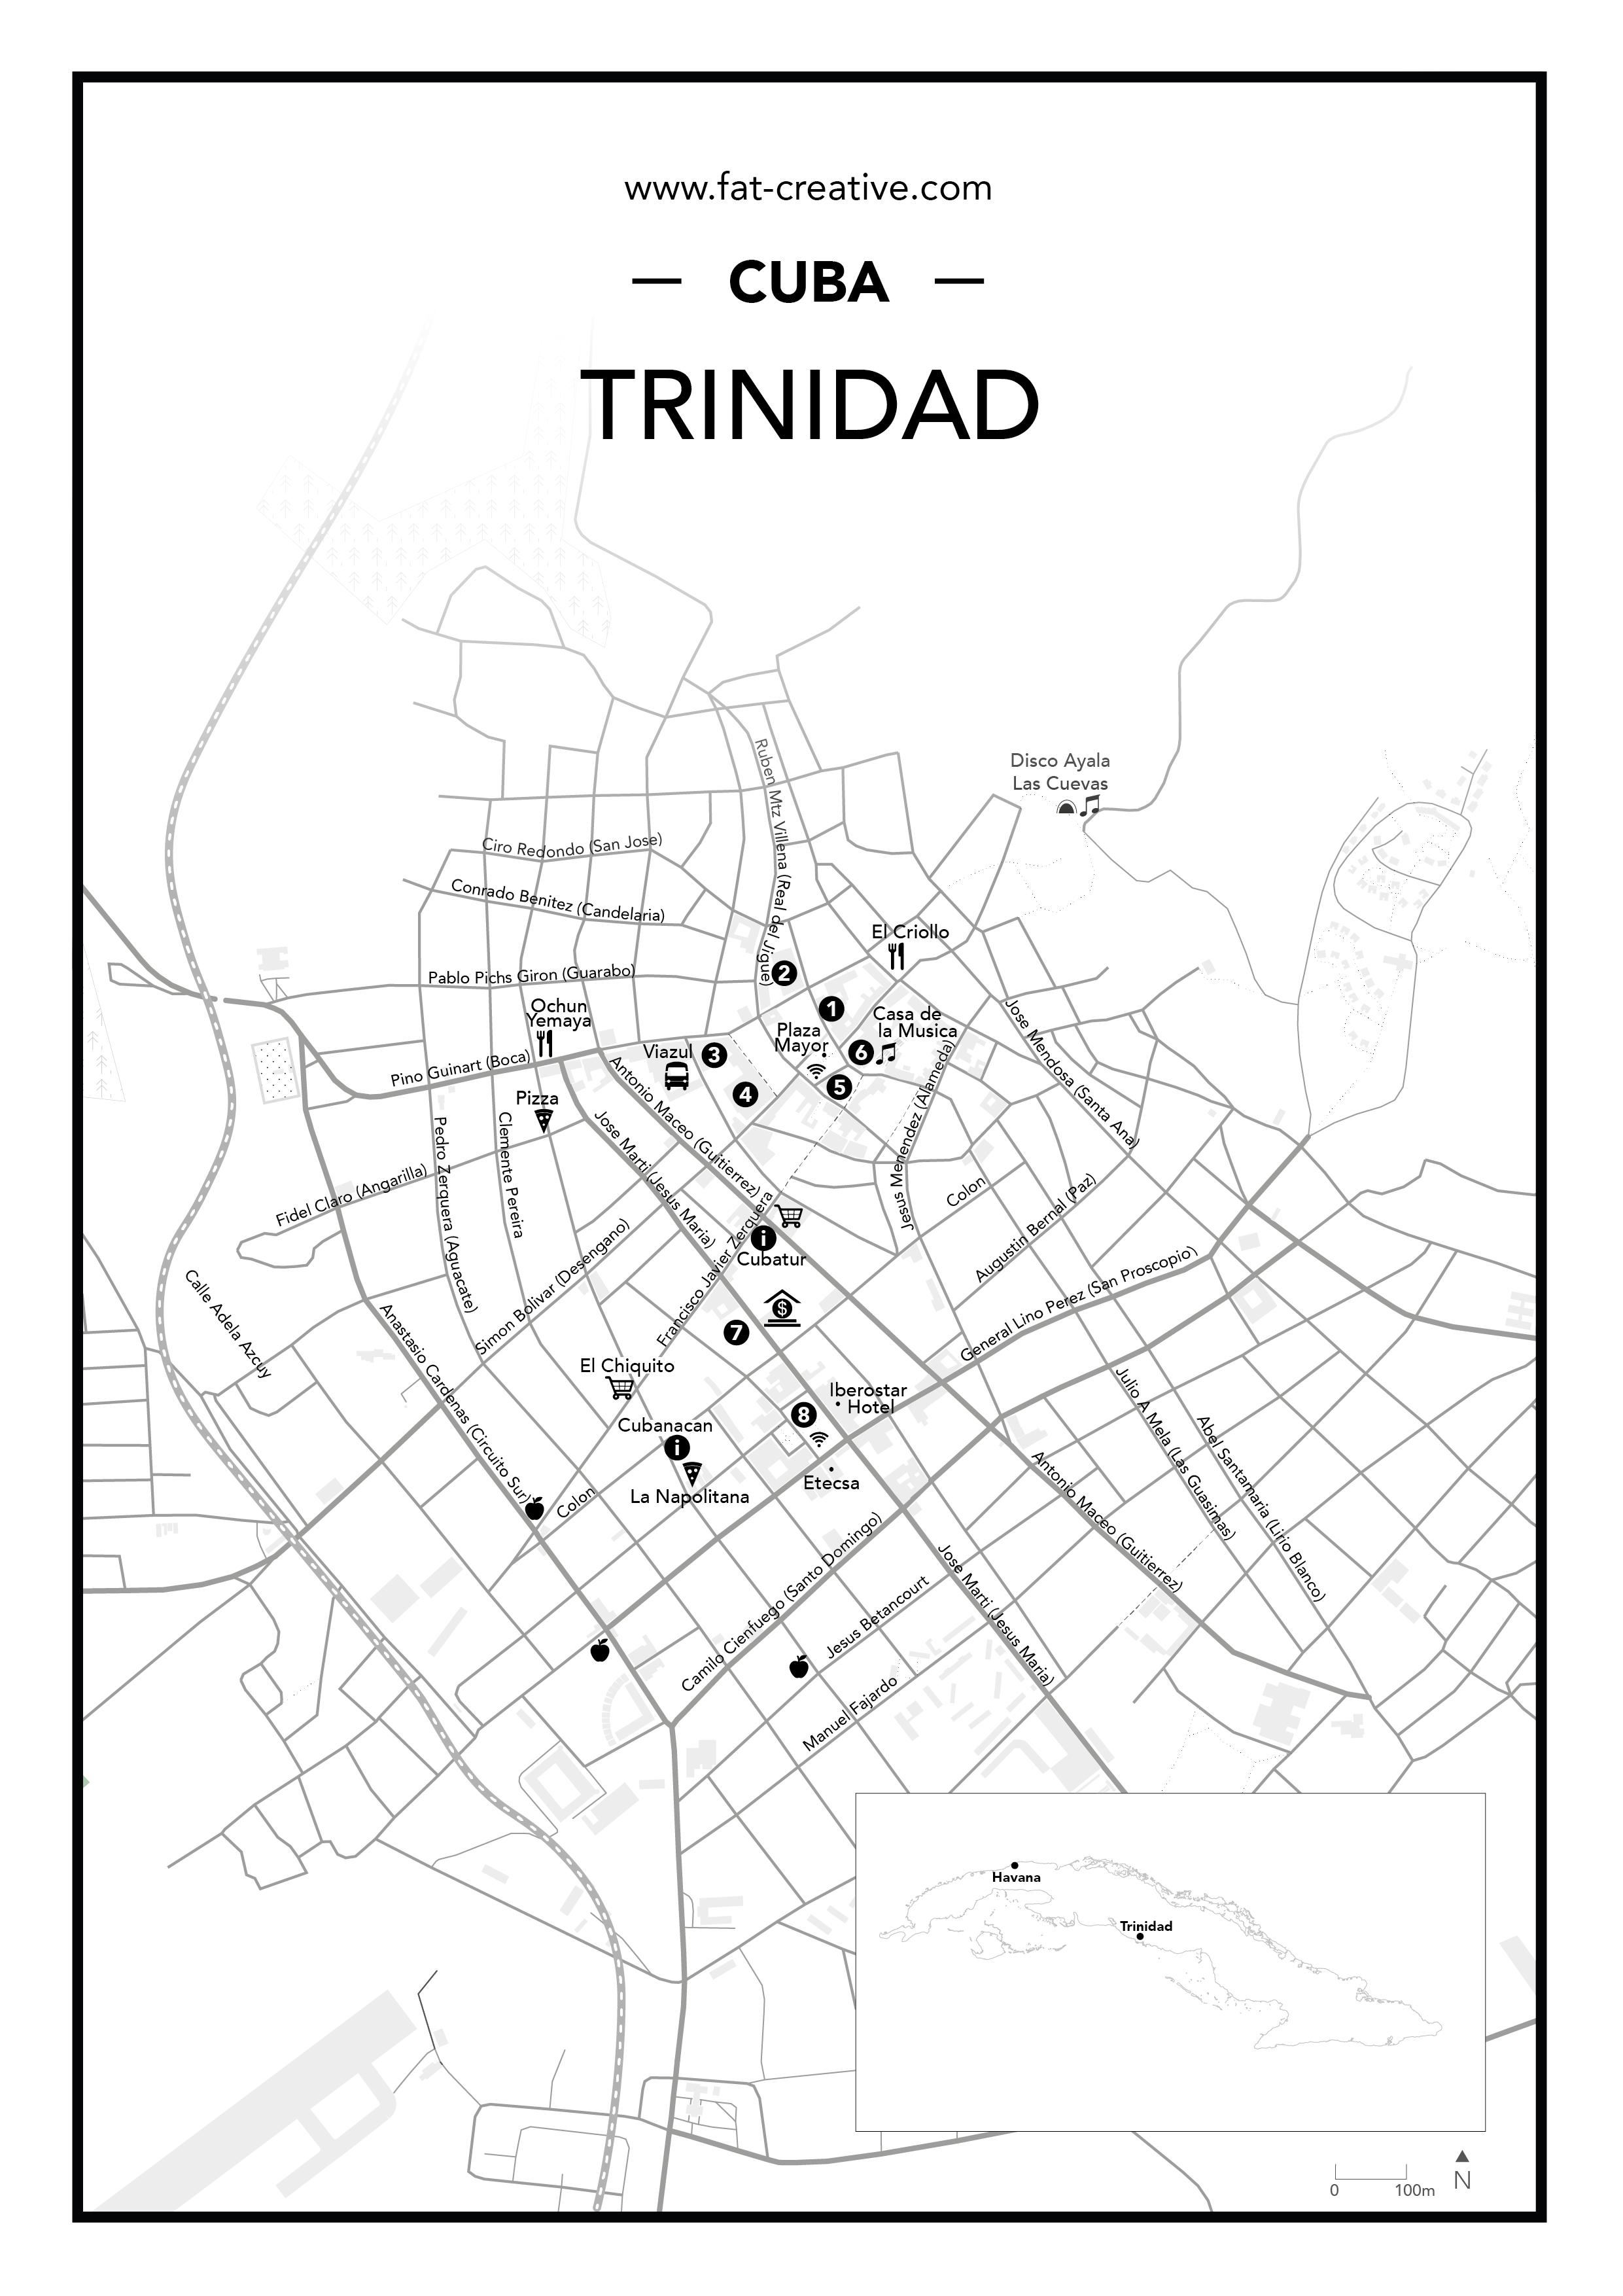 Trinidad-map-00-01.png